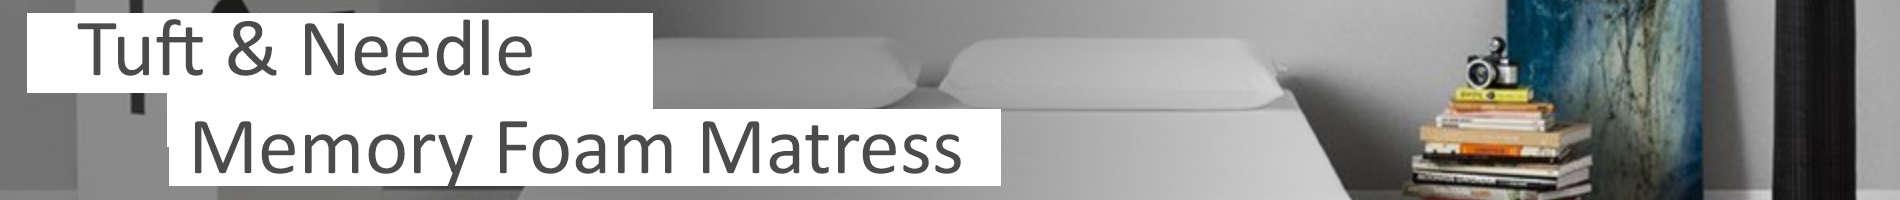 Tuft and Needle Mattress Memory Foam